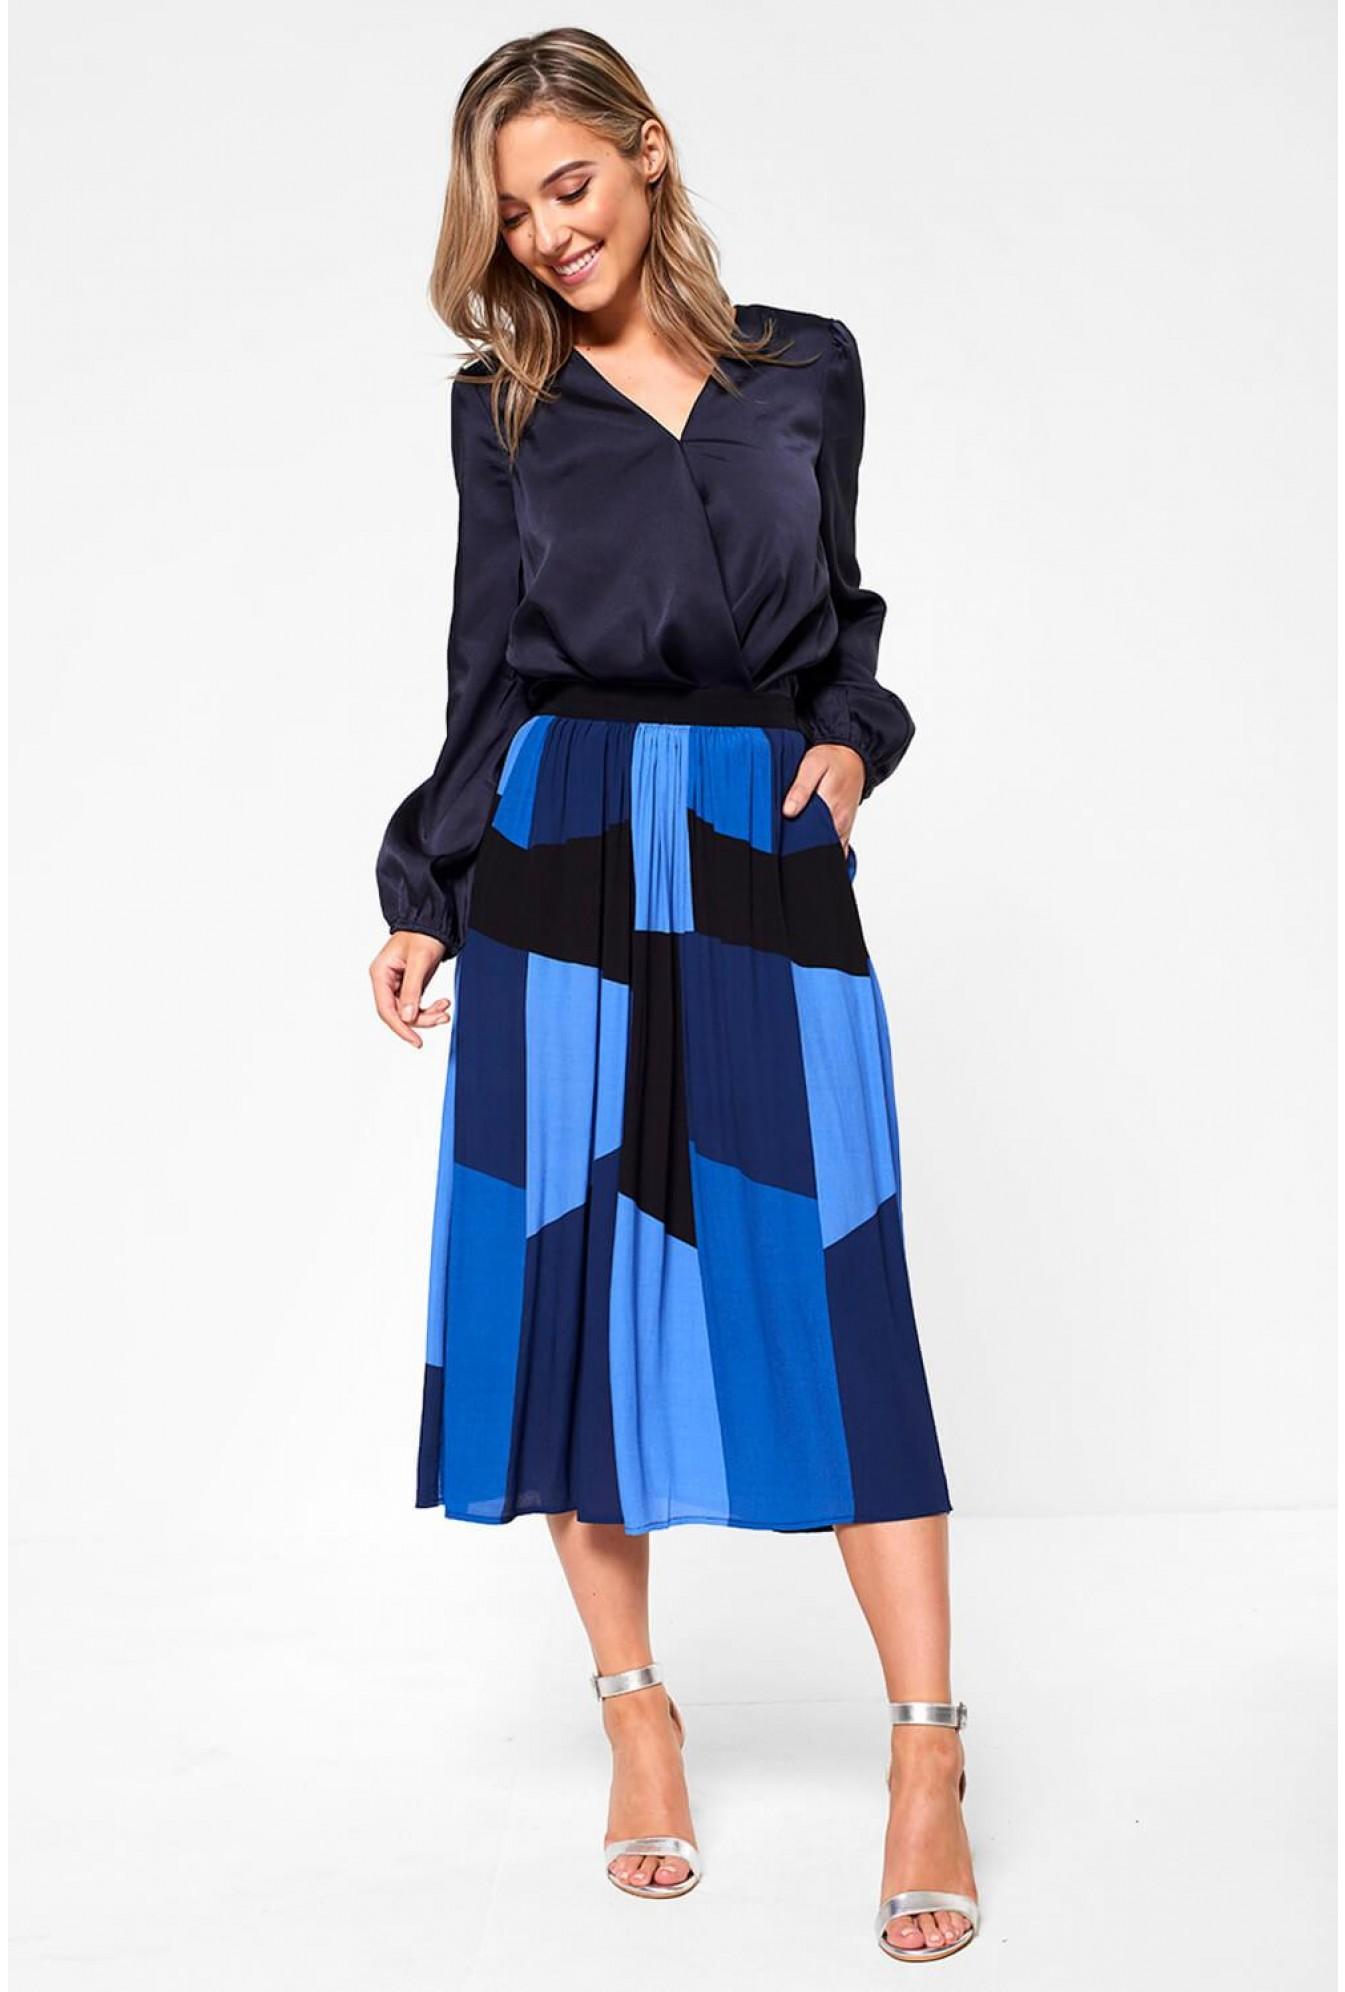 abd7b6395 Vero Moda Molly High Waist Knee Skirt in Blue | iCLOTHING